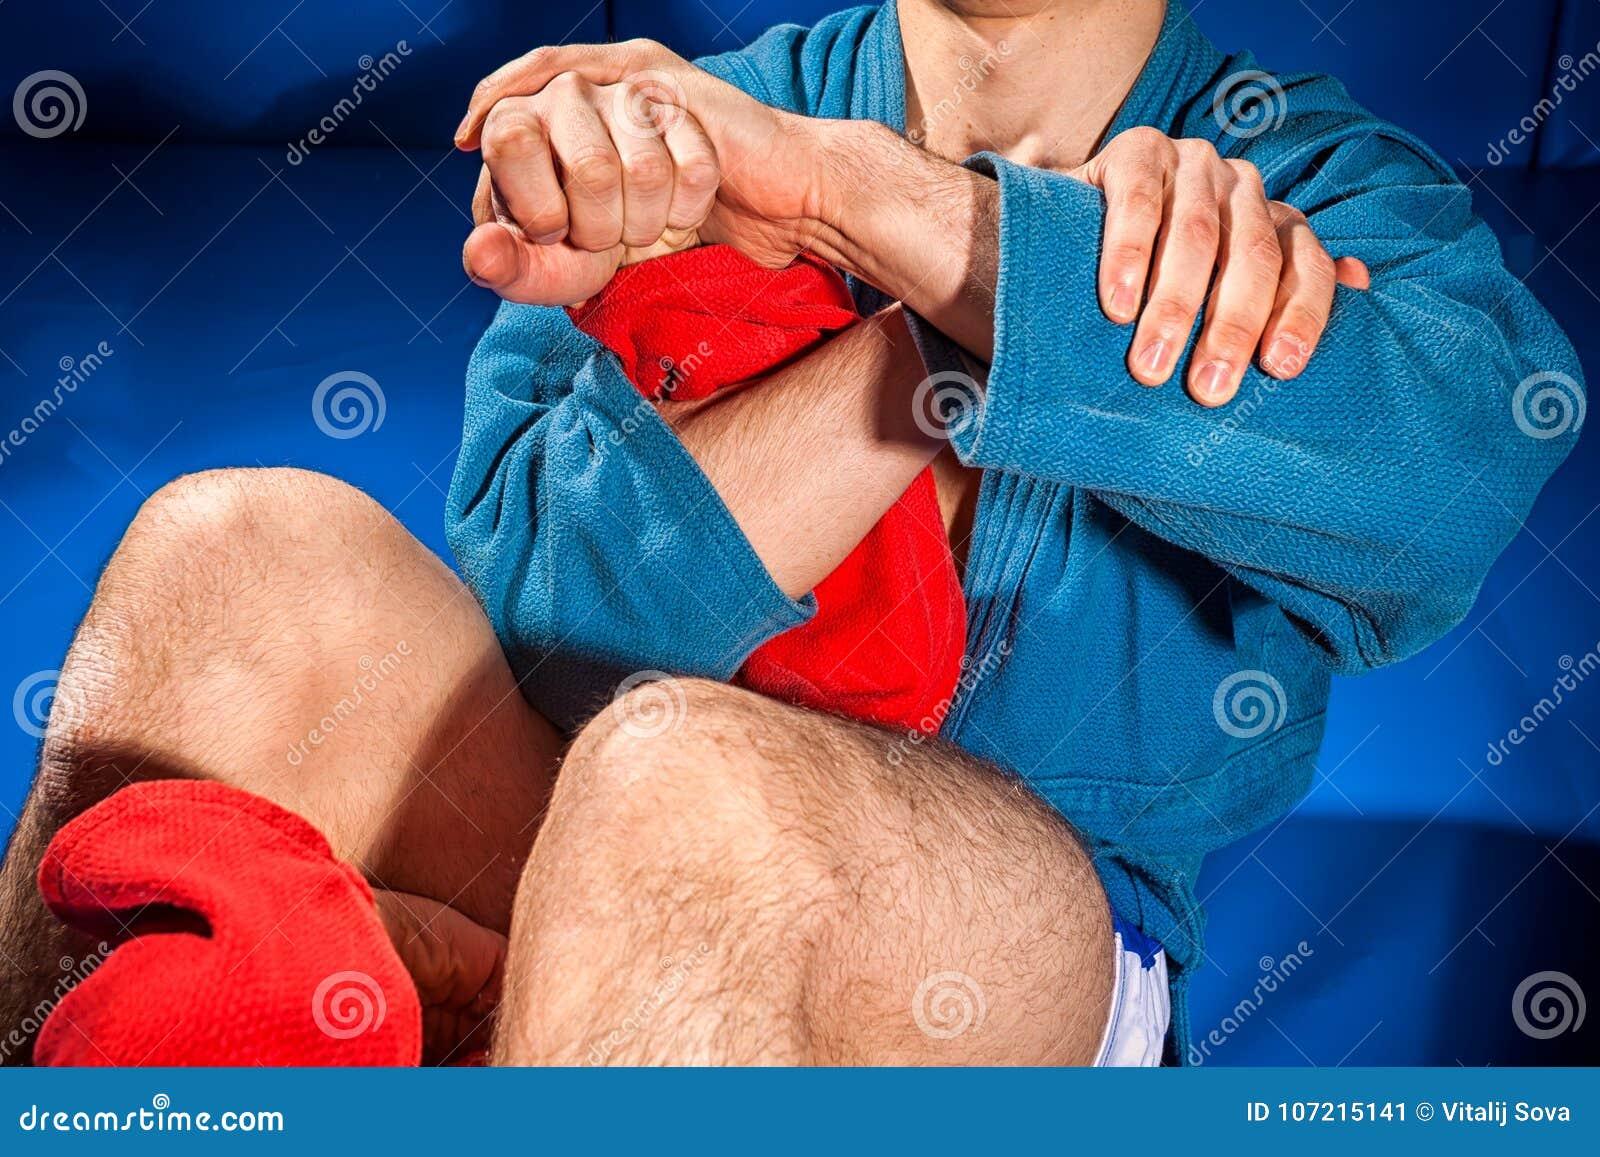 Man wrestler makes submission wrestling